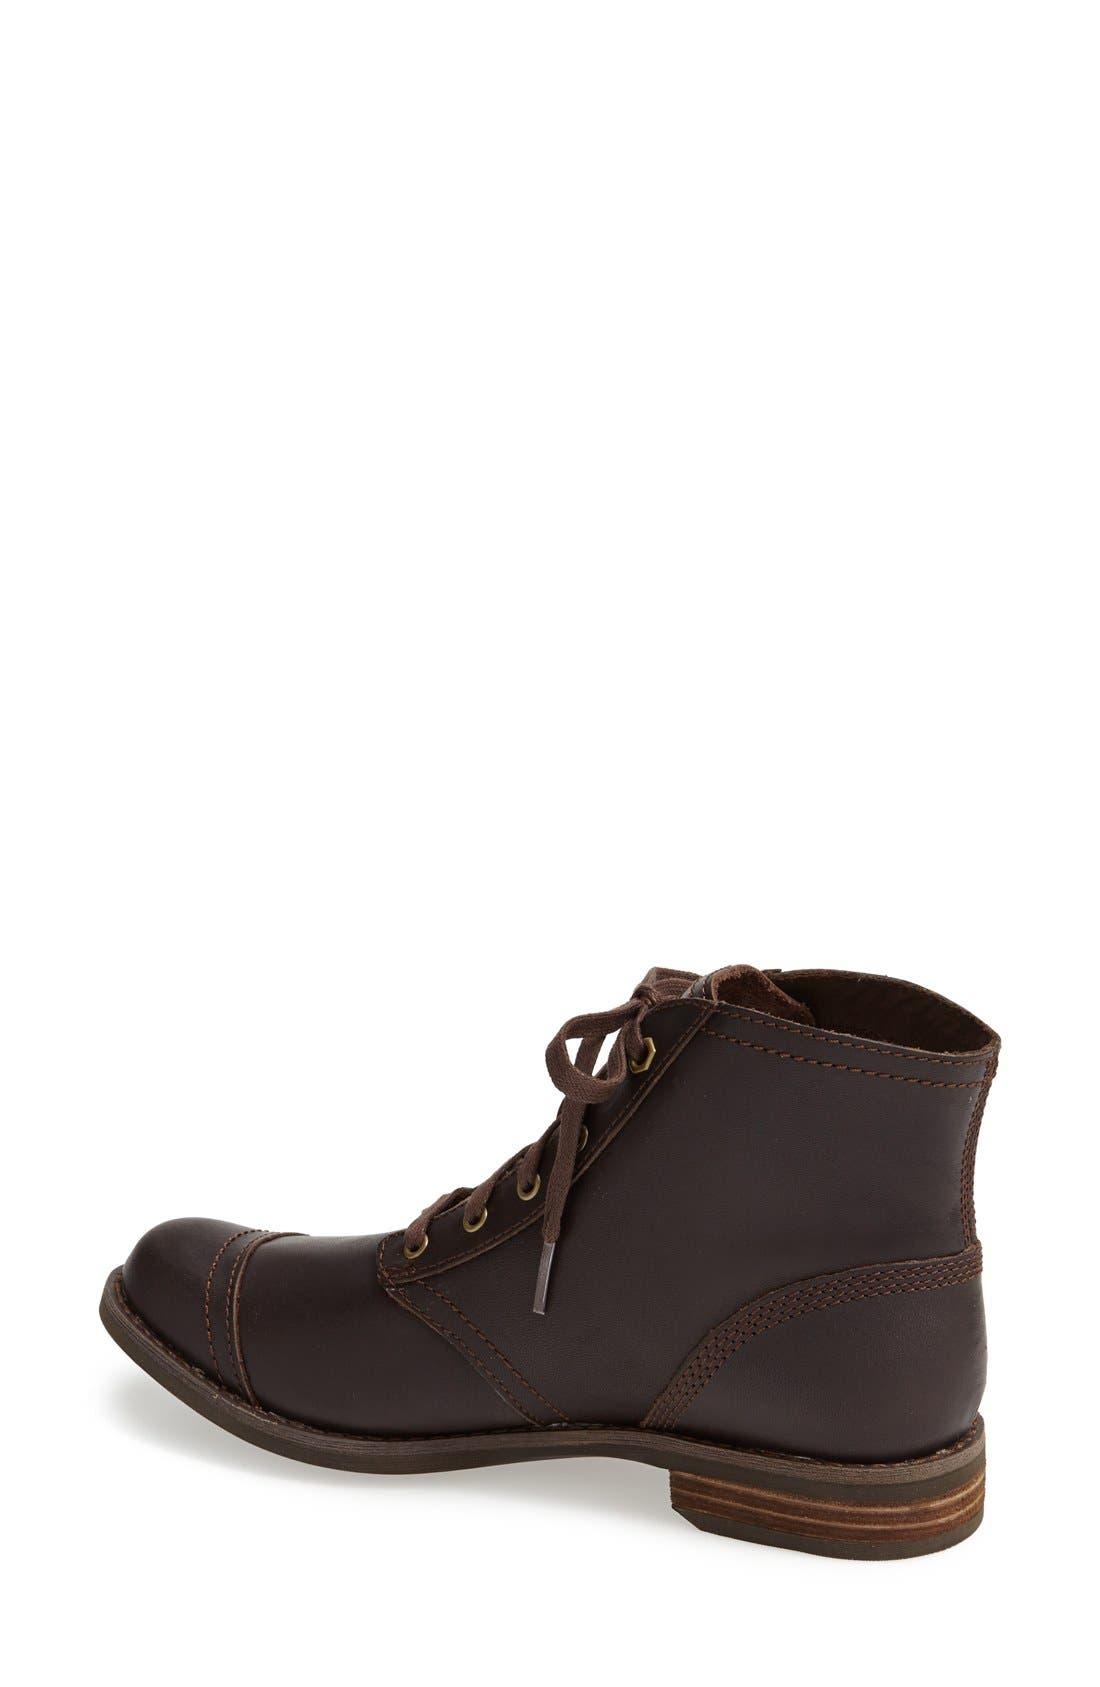 Alternate Image 2  - Timberland 'Savin Hill' Leather Chukka Bootie (Women)